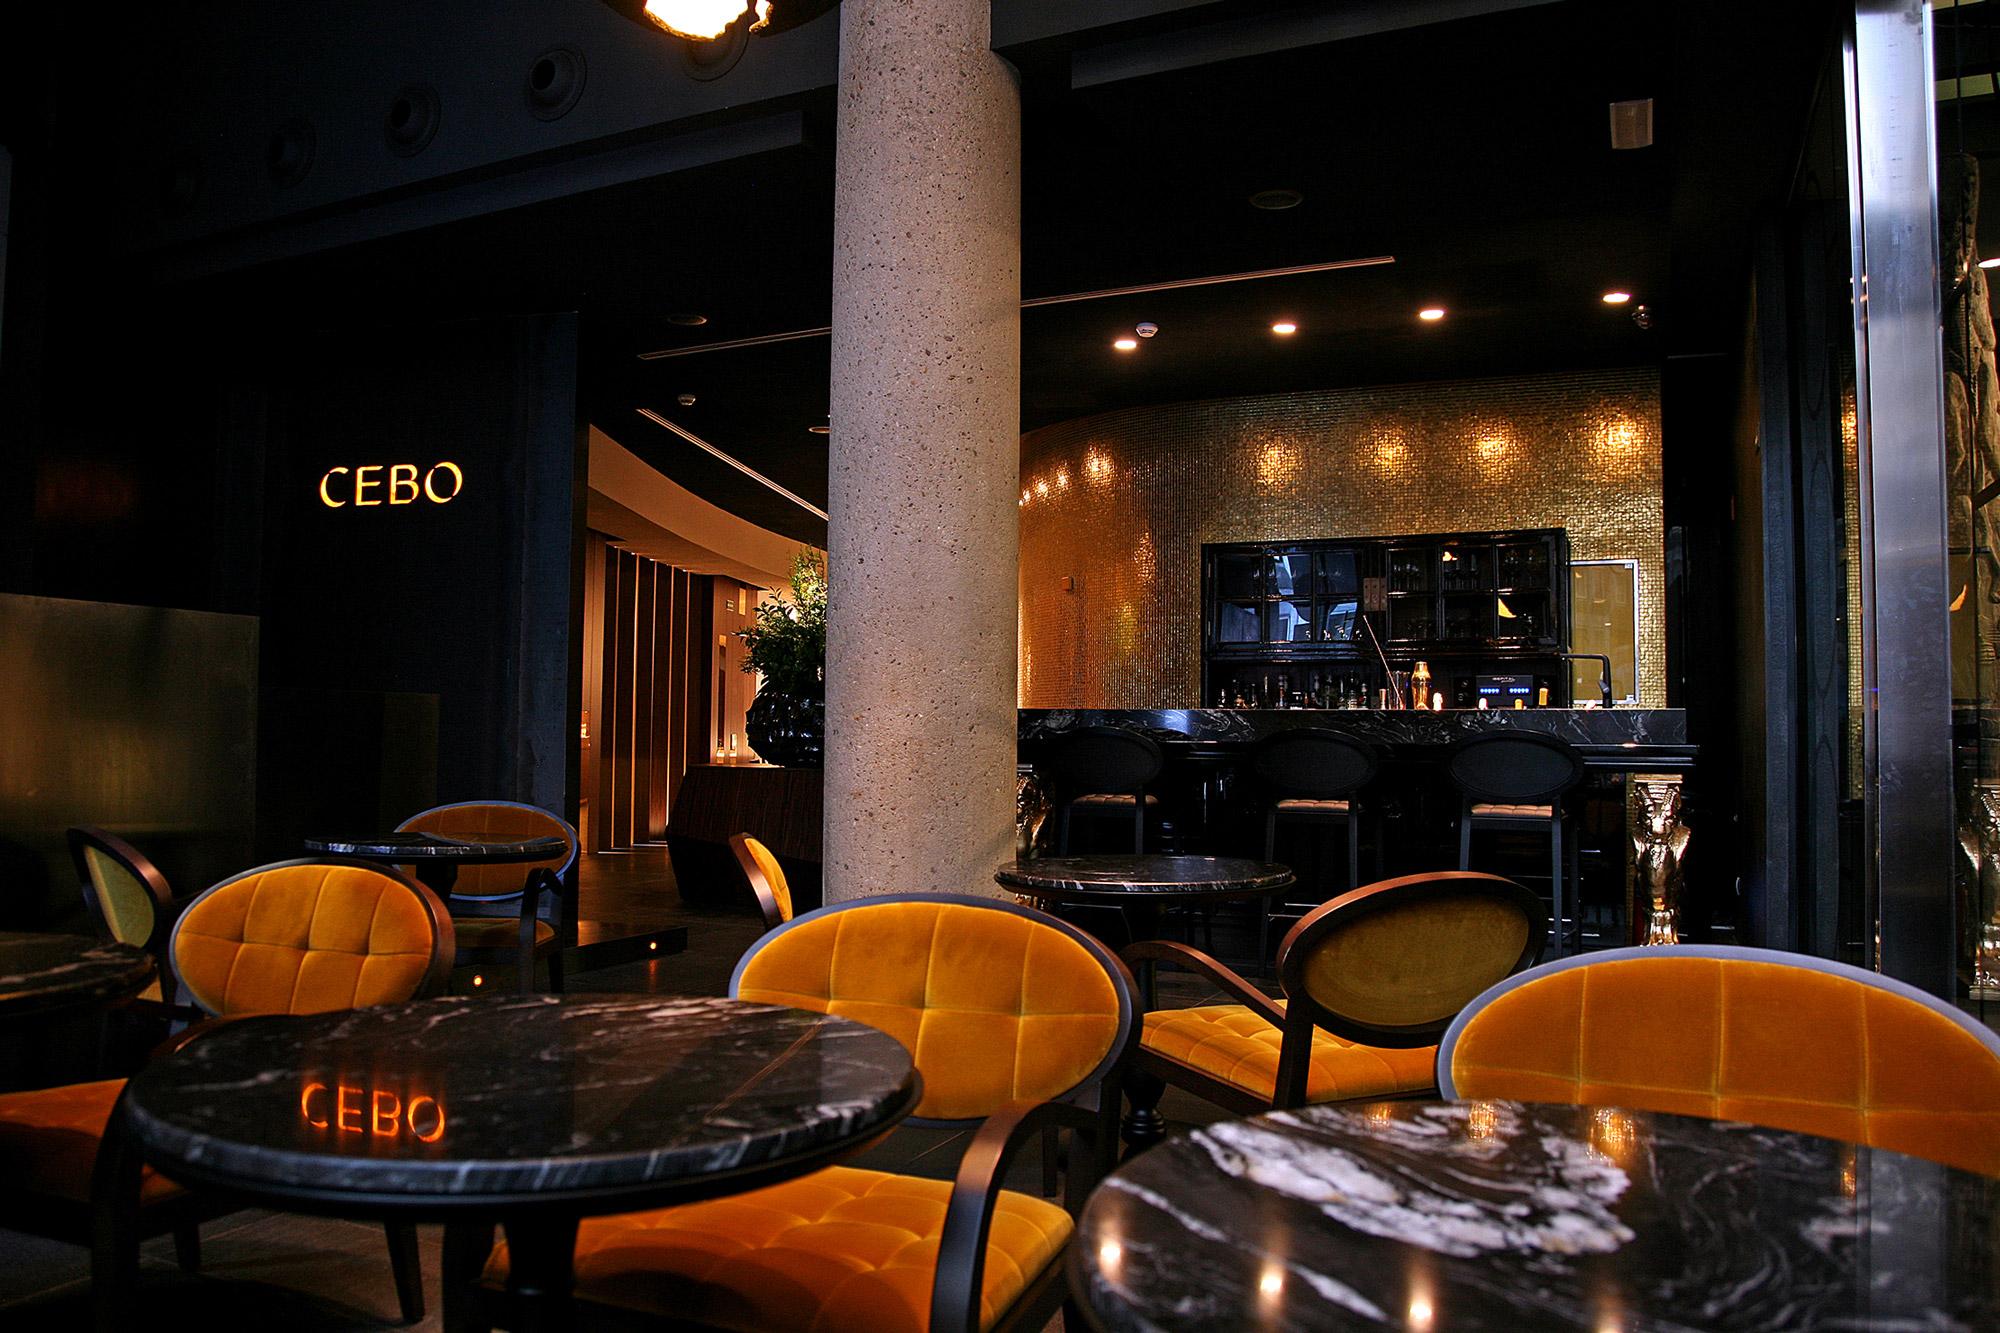 Restaurante Cebo